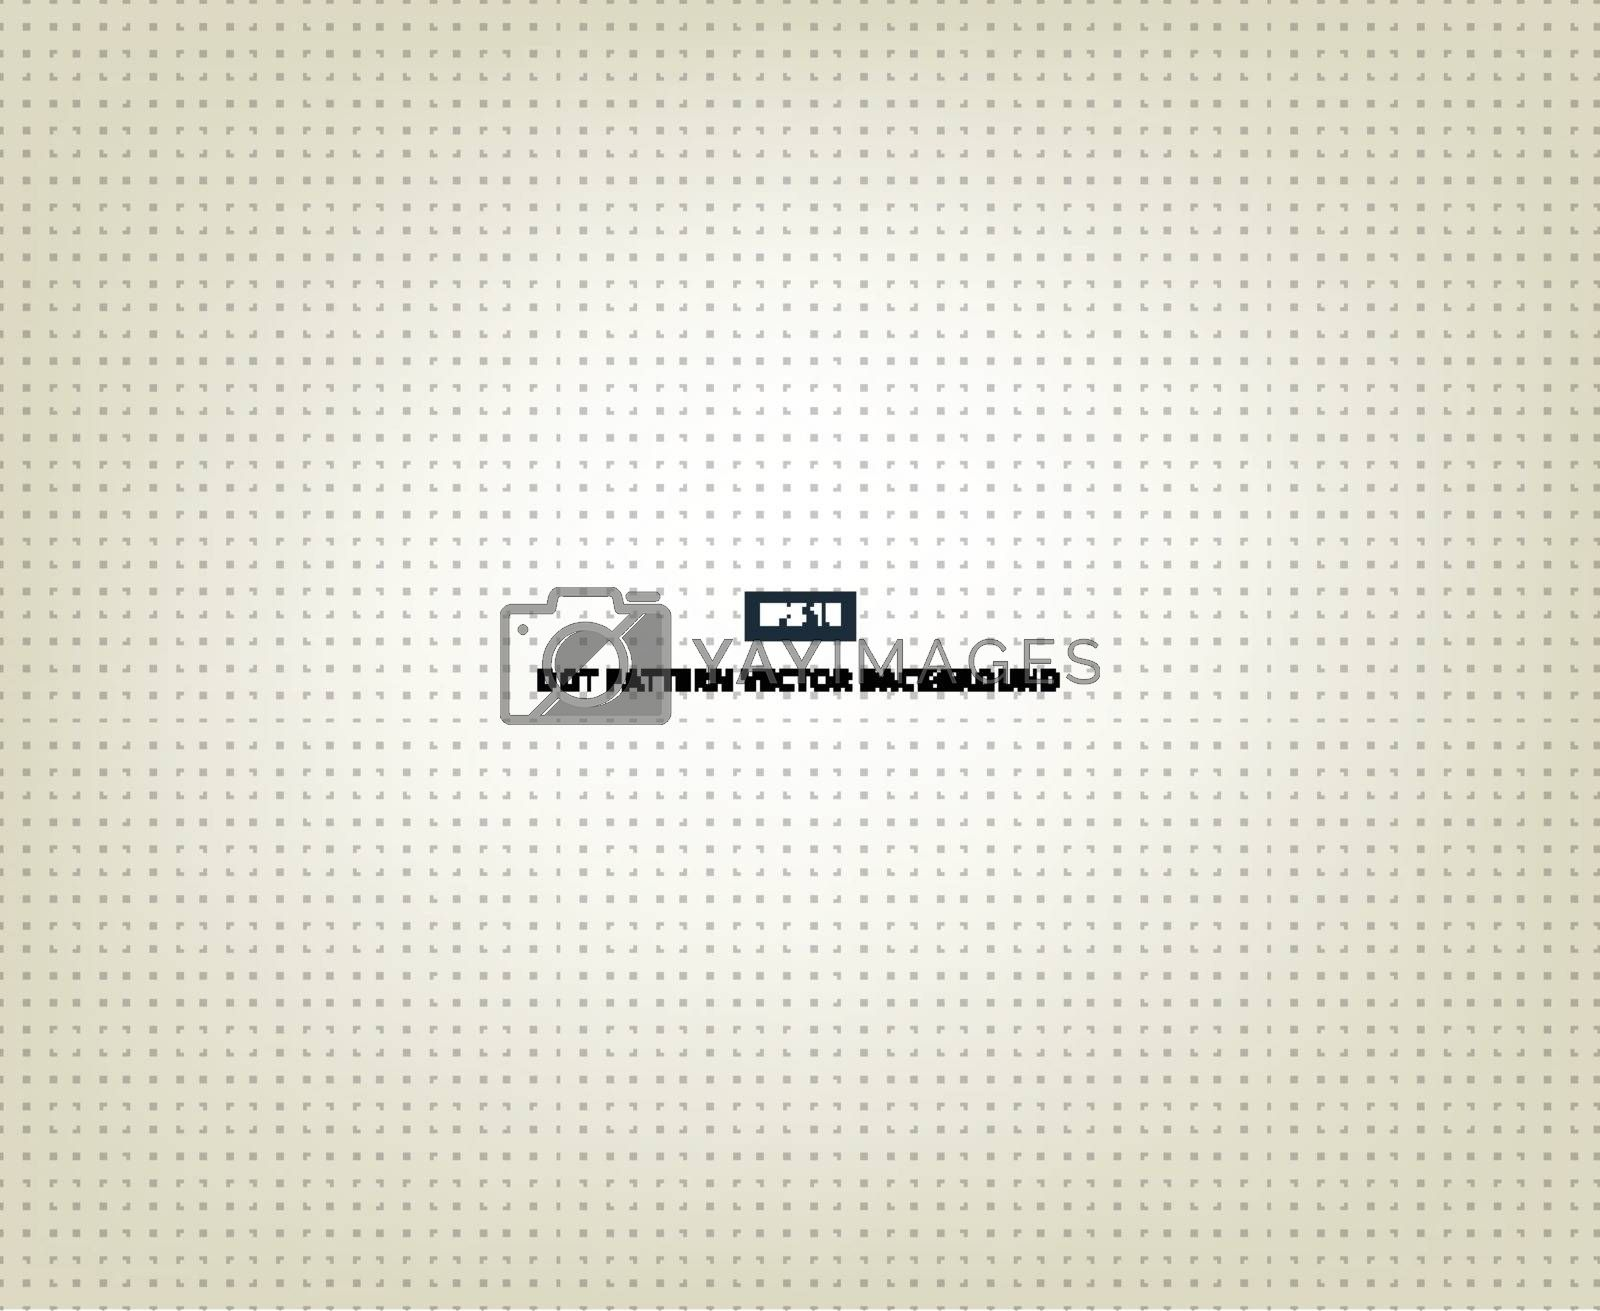 Seamless Gray Polka Dot Background vector